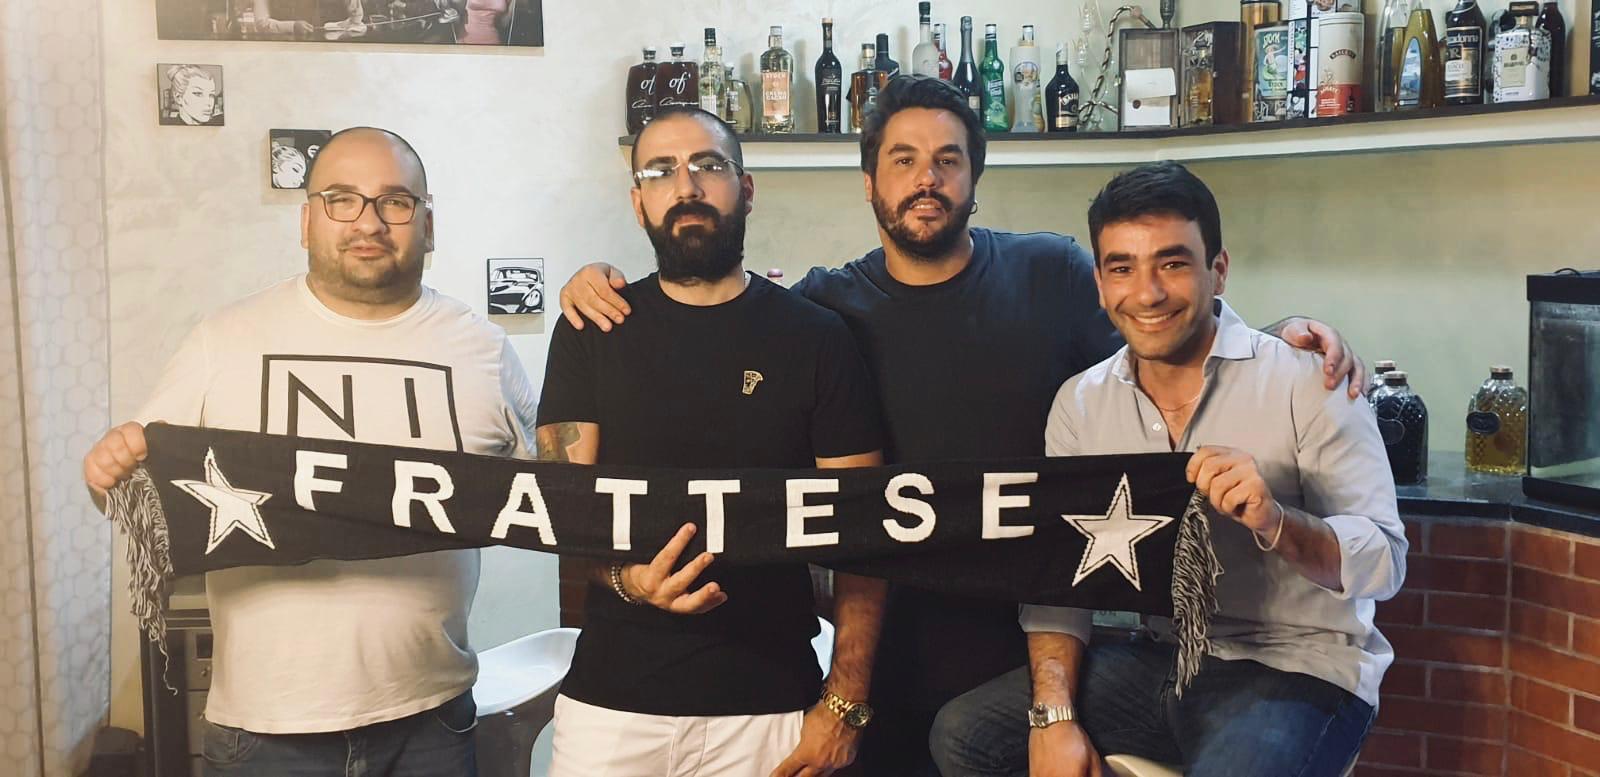 Peppe Di Martino, Raffaele Guarino, Angelo Cesaro, Sirio Giametta